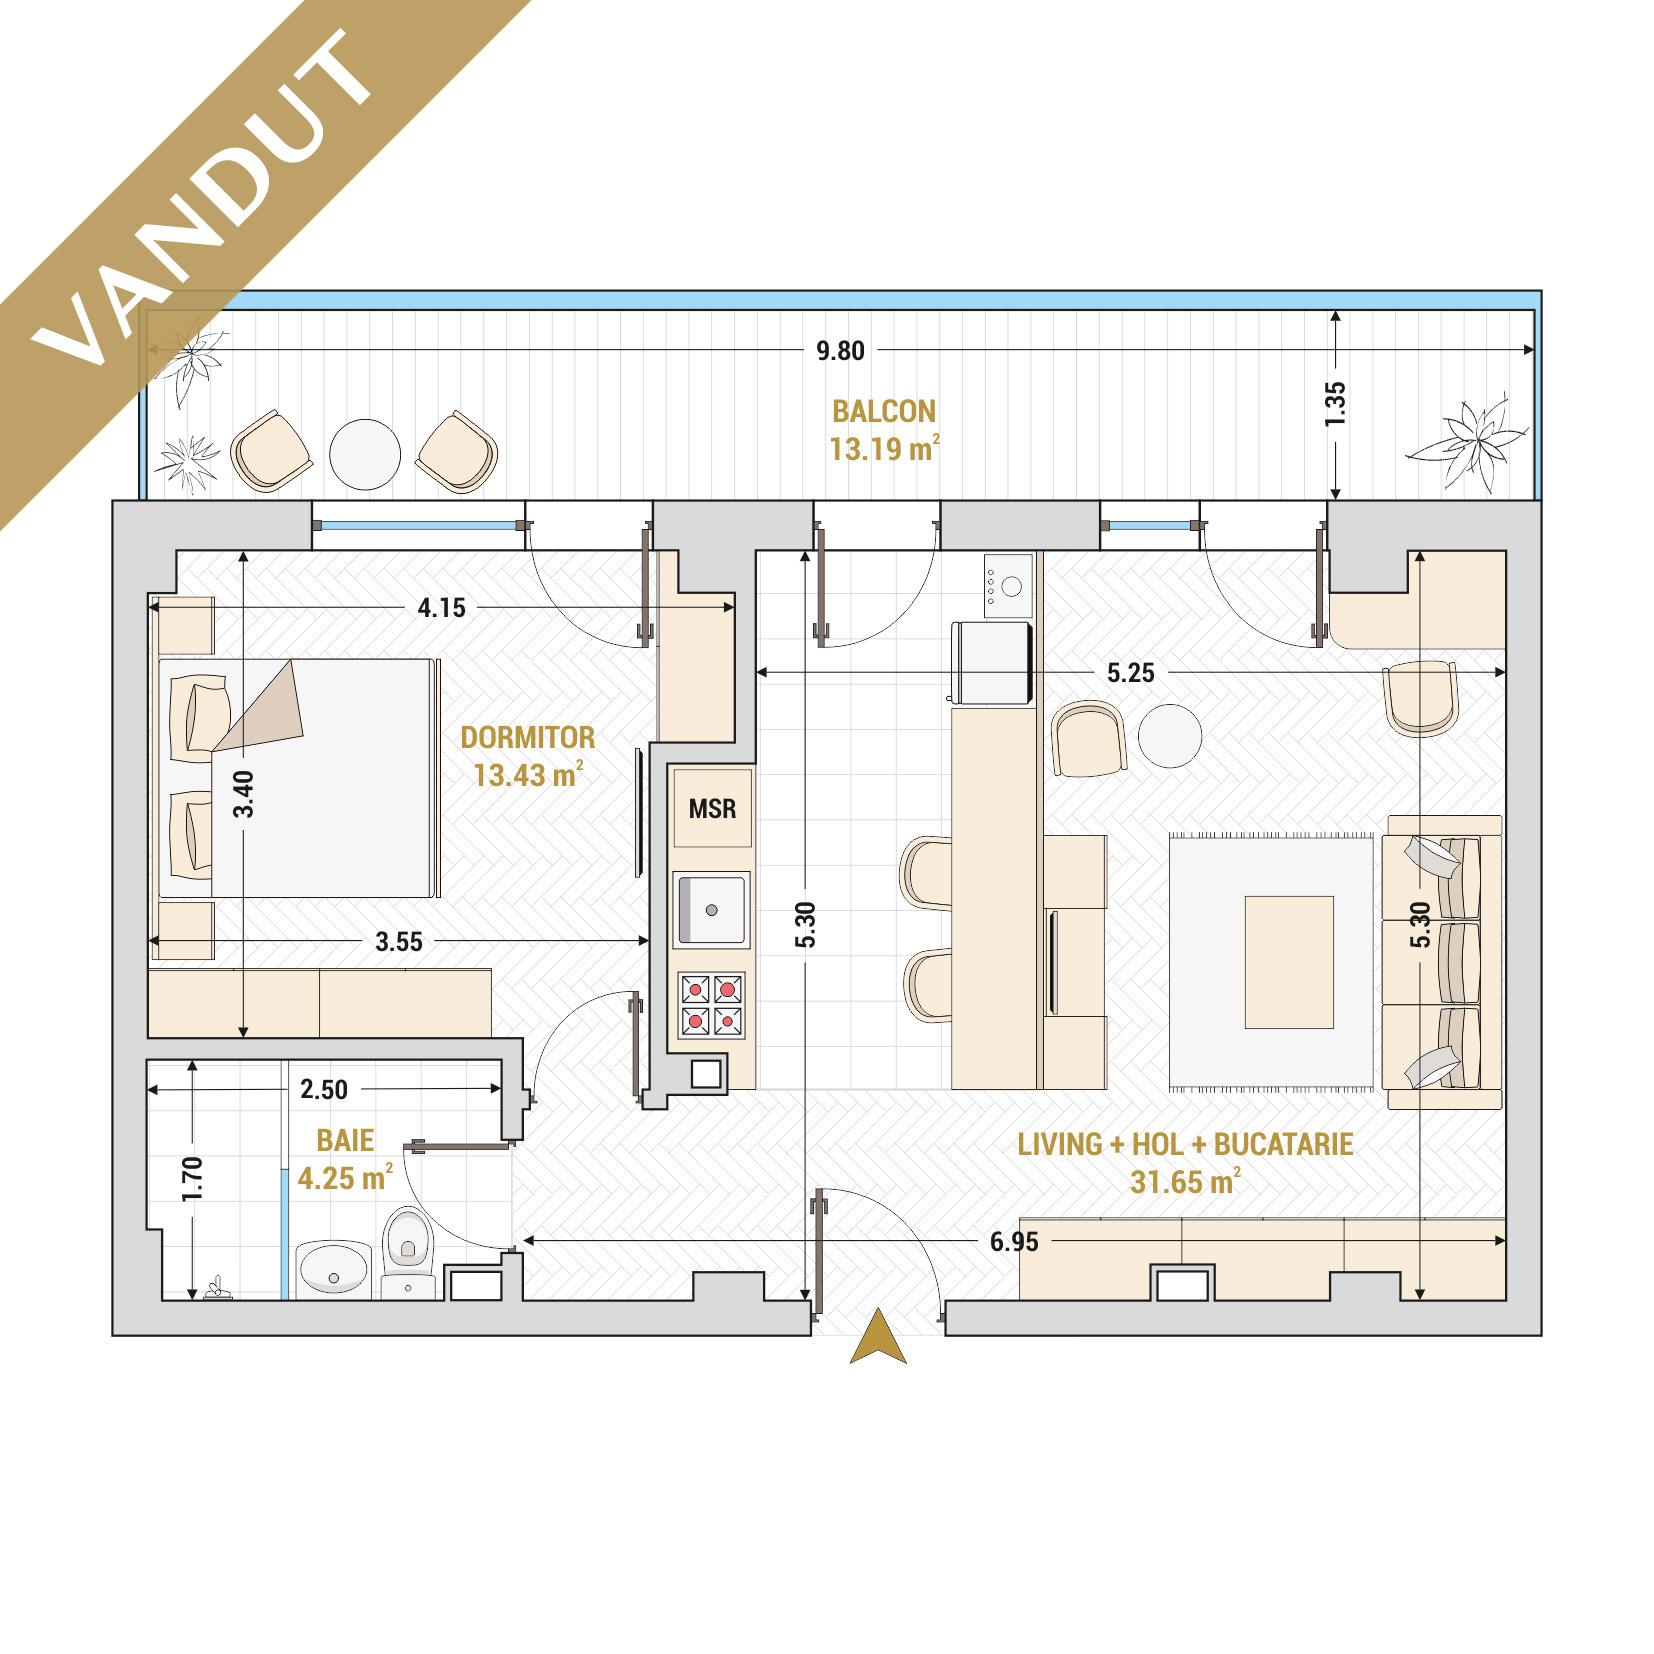 Apartamente cu 2 camere de vanzare Bucuresti - Catedral Residence - Marriott, Piata Unirii, 13 Septembrie, Izvor - Tip 6 - T1A - V